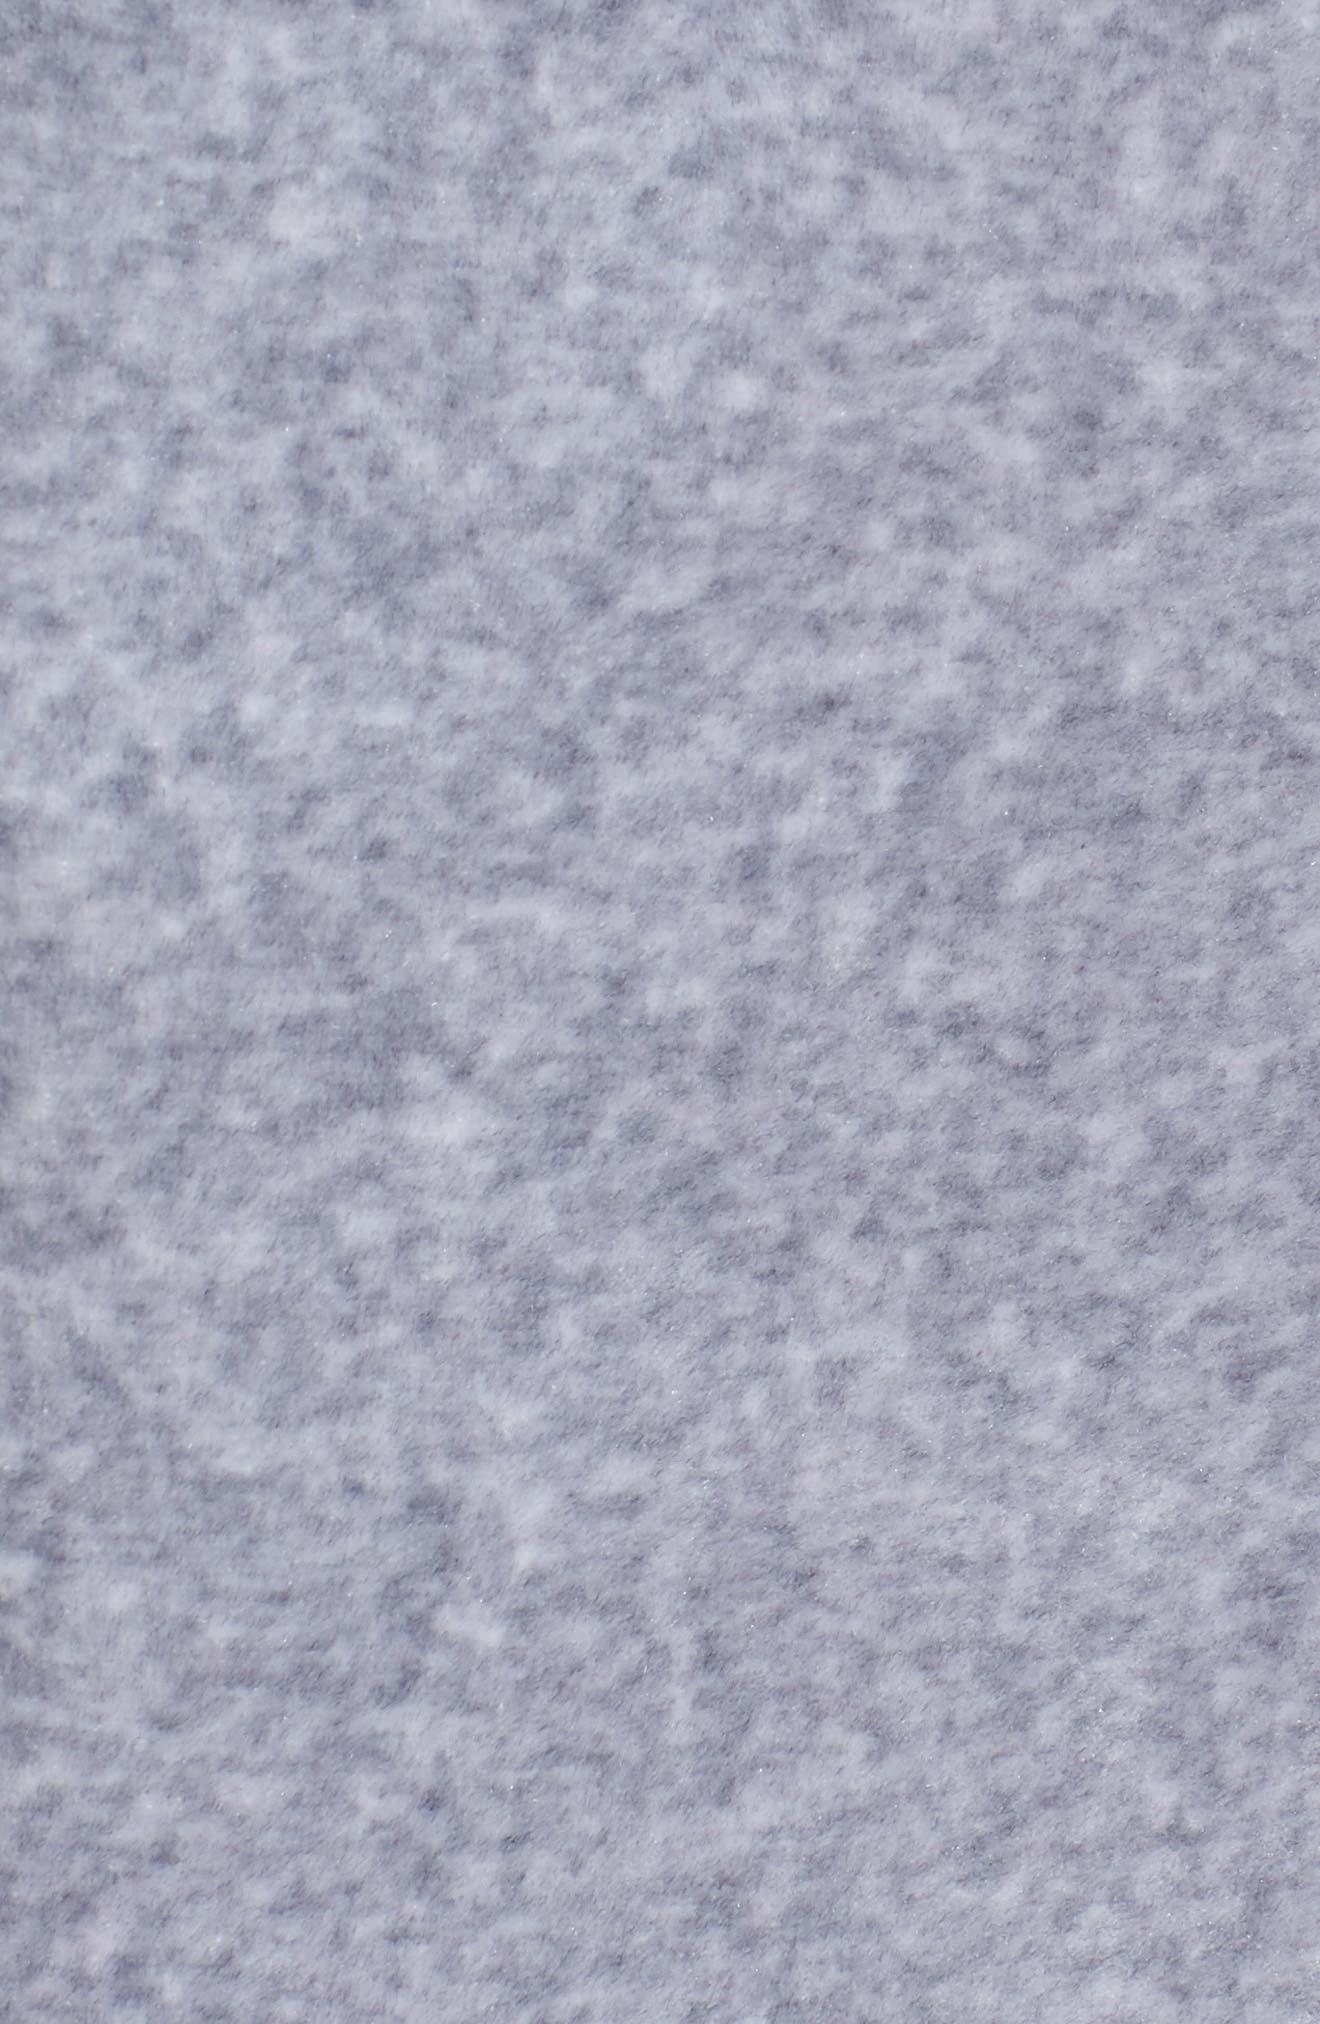 Colorblock Velour Wide Leg Pants,                             Alternate thumbnail 6, color,                             Silver Lining Angel Combo